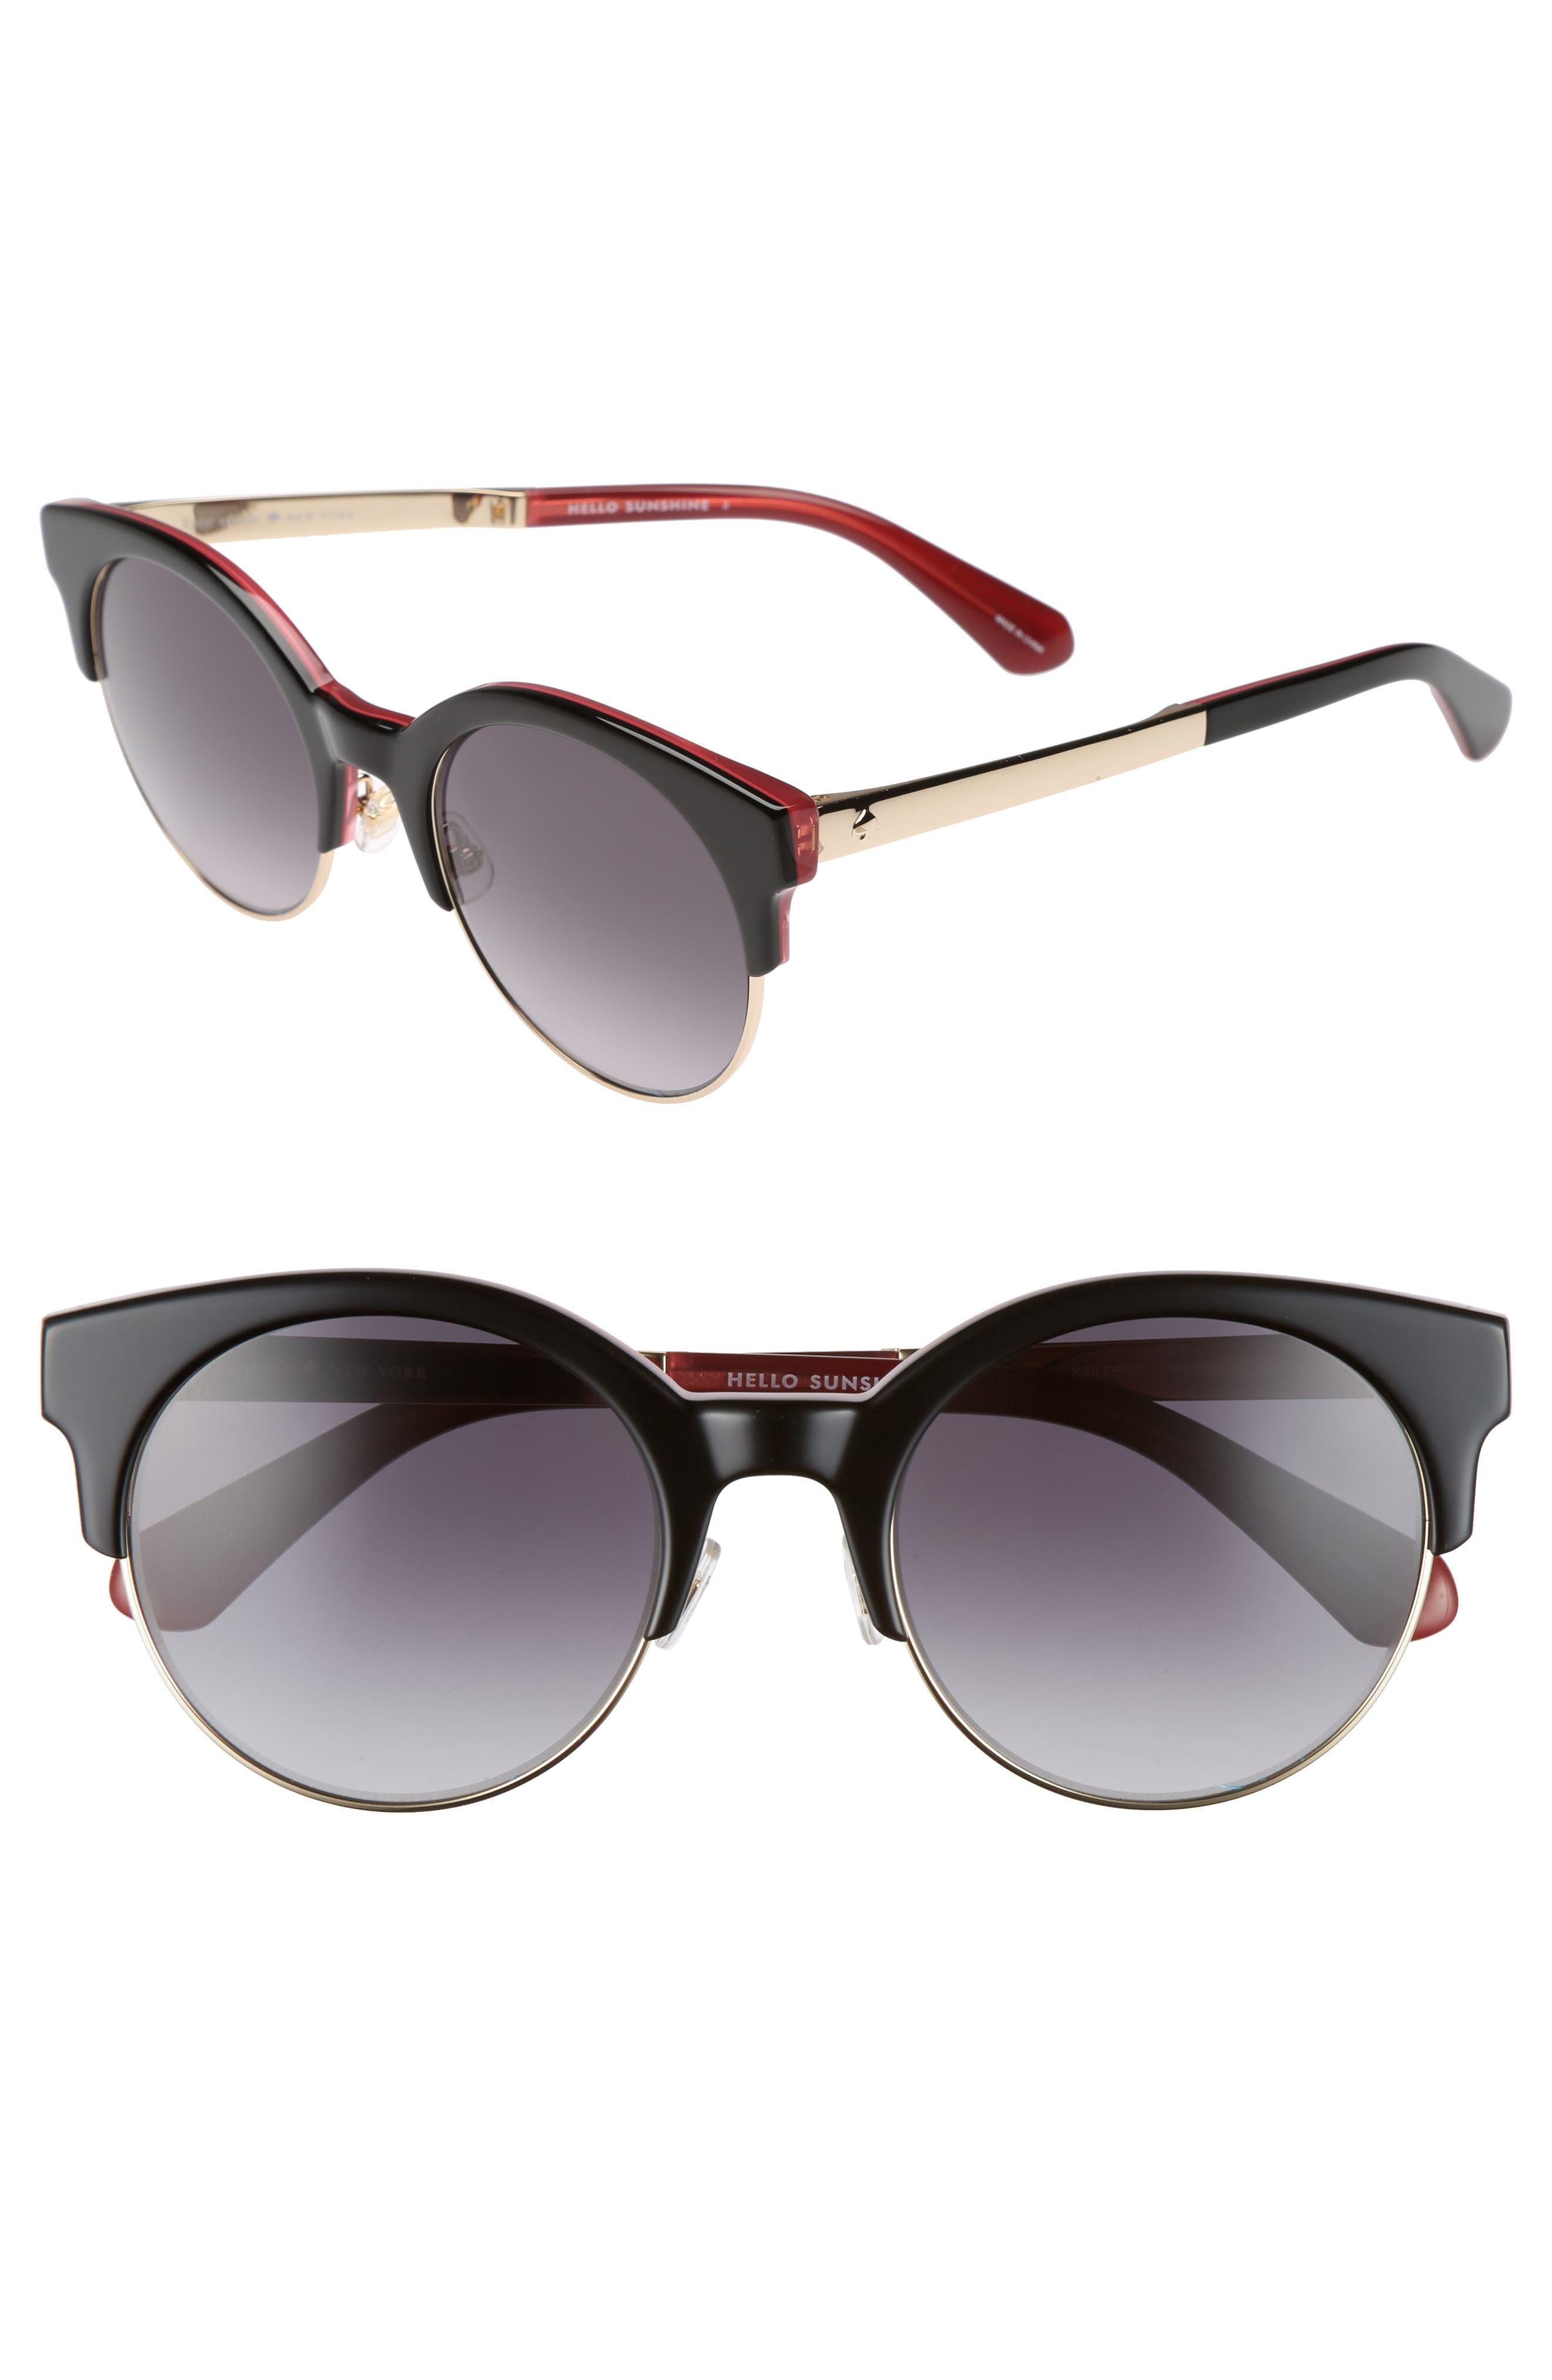 kaileen 52mm semi-rimless cat eye sunglasses,                             Main thumbnail 1, color,                             001